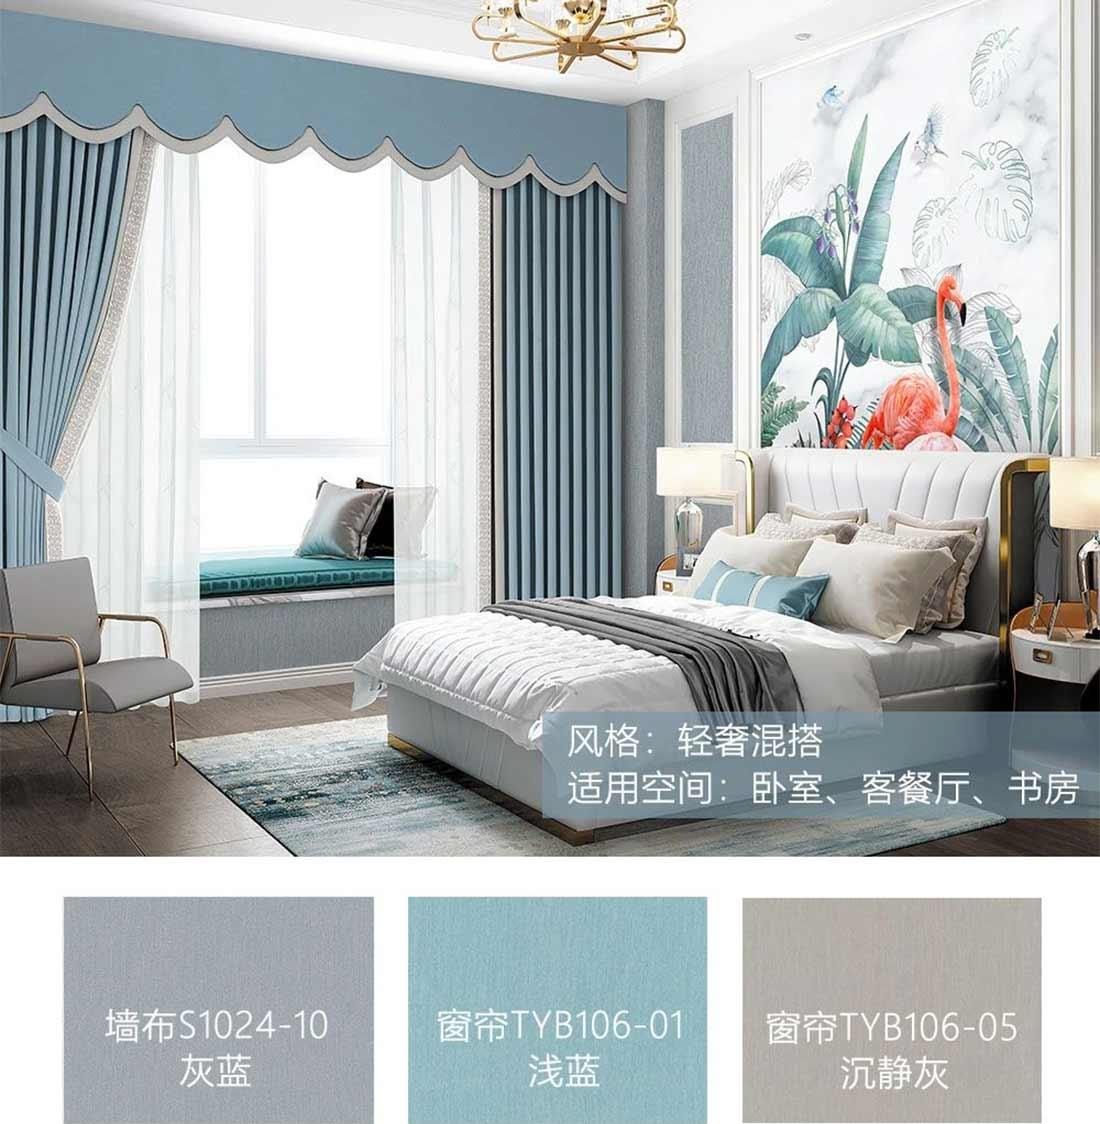 JCC天洋窗帘墙布轻奢软装搭配